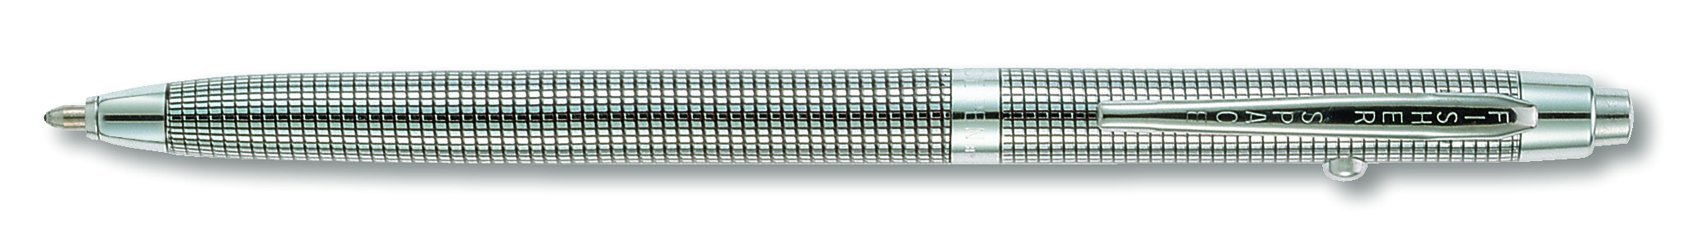 Fisher Space Black Grid Design Shuttle Space Pen (B4)